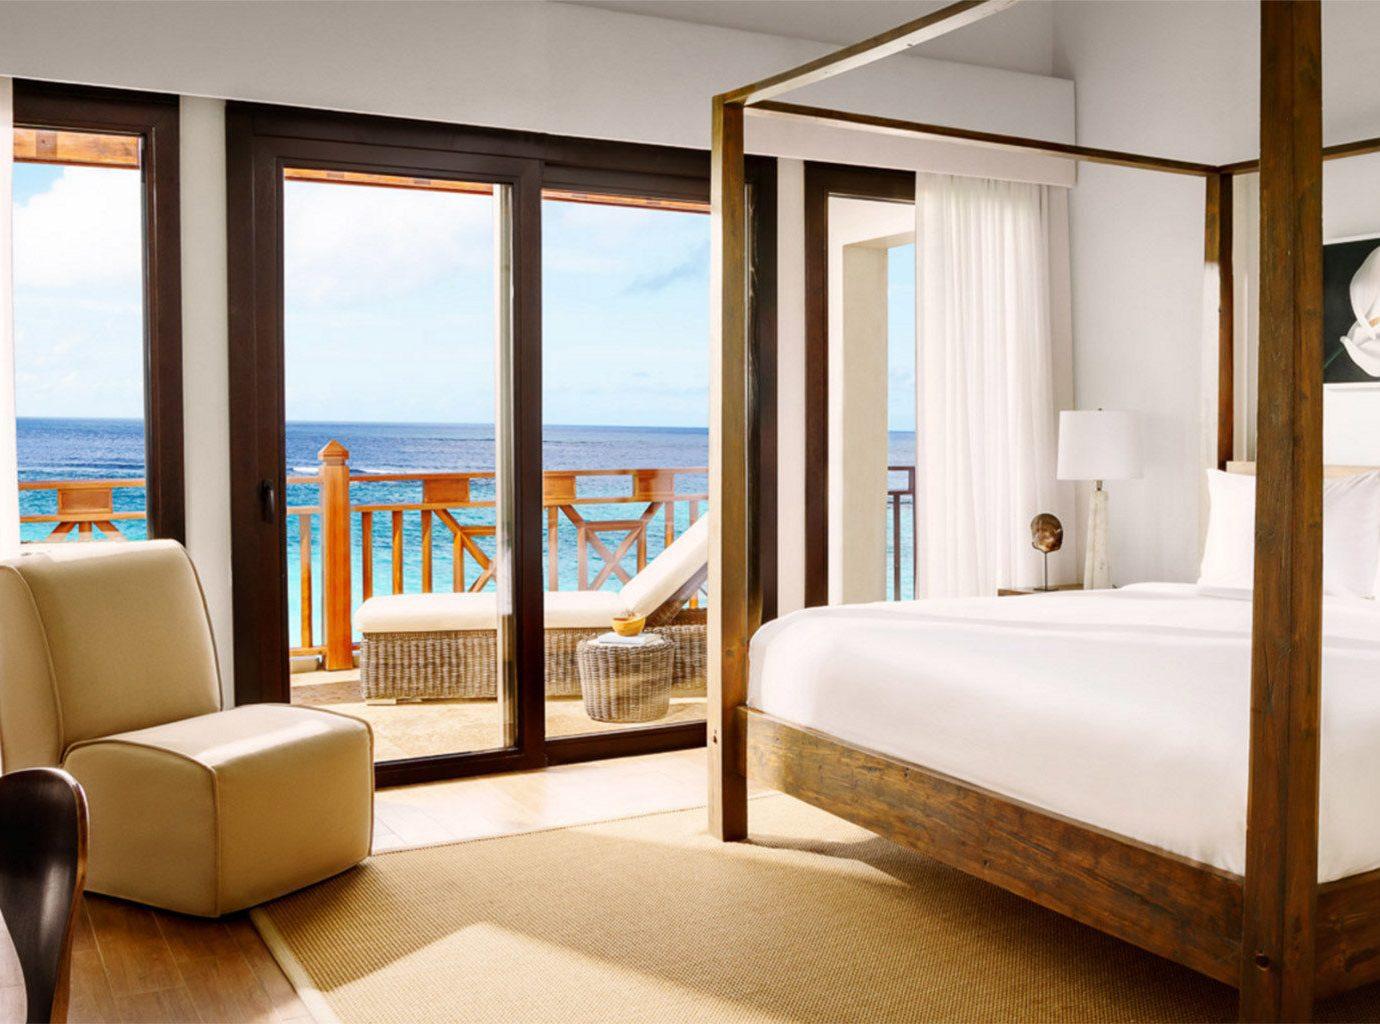 Hotels Trip Ideas indoor floor bed room window hotel property Suite Bedroom living room home interior design estate condominium real estate furniture Design nice apartment wood